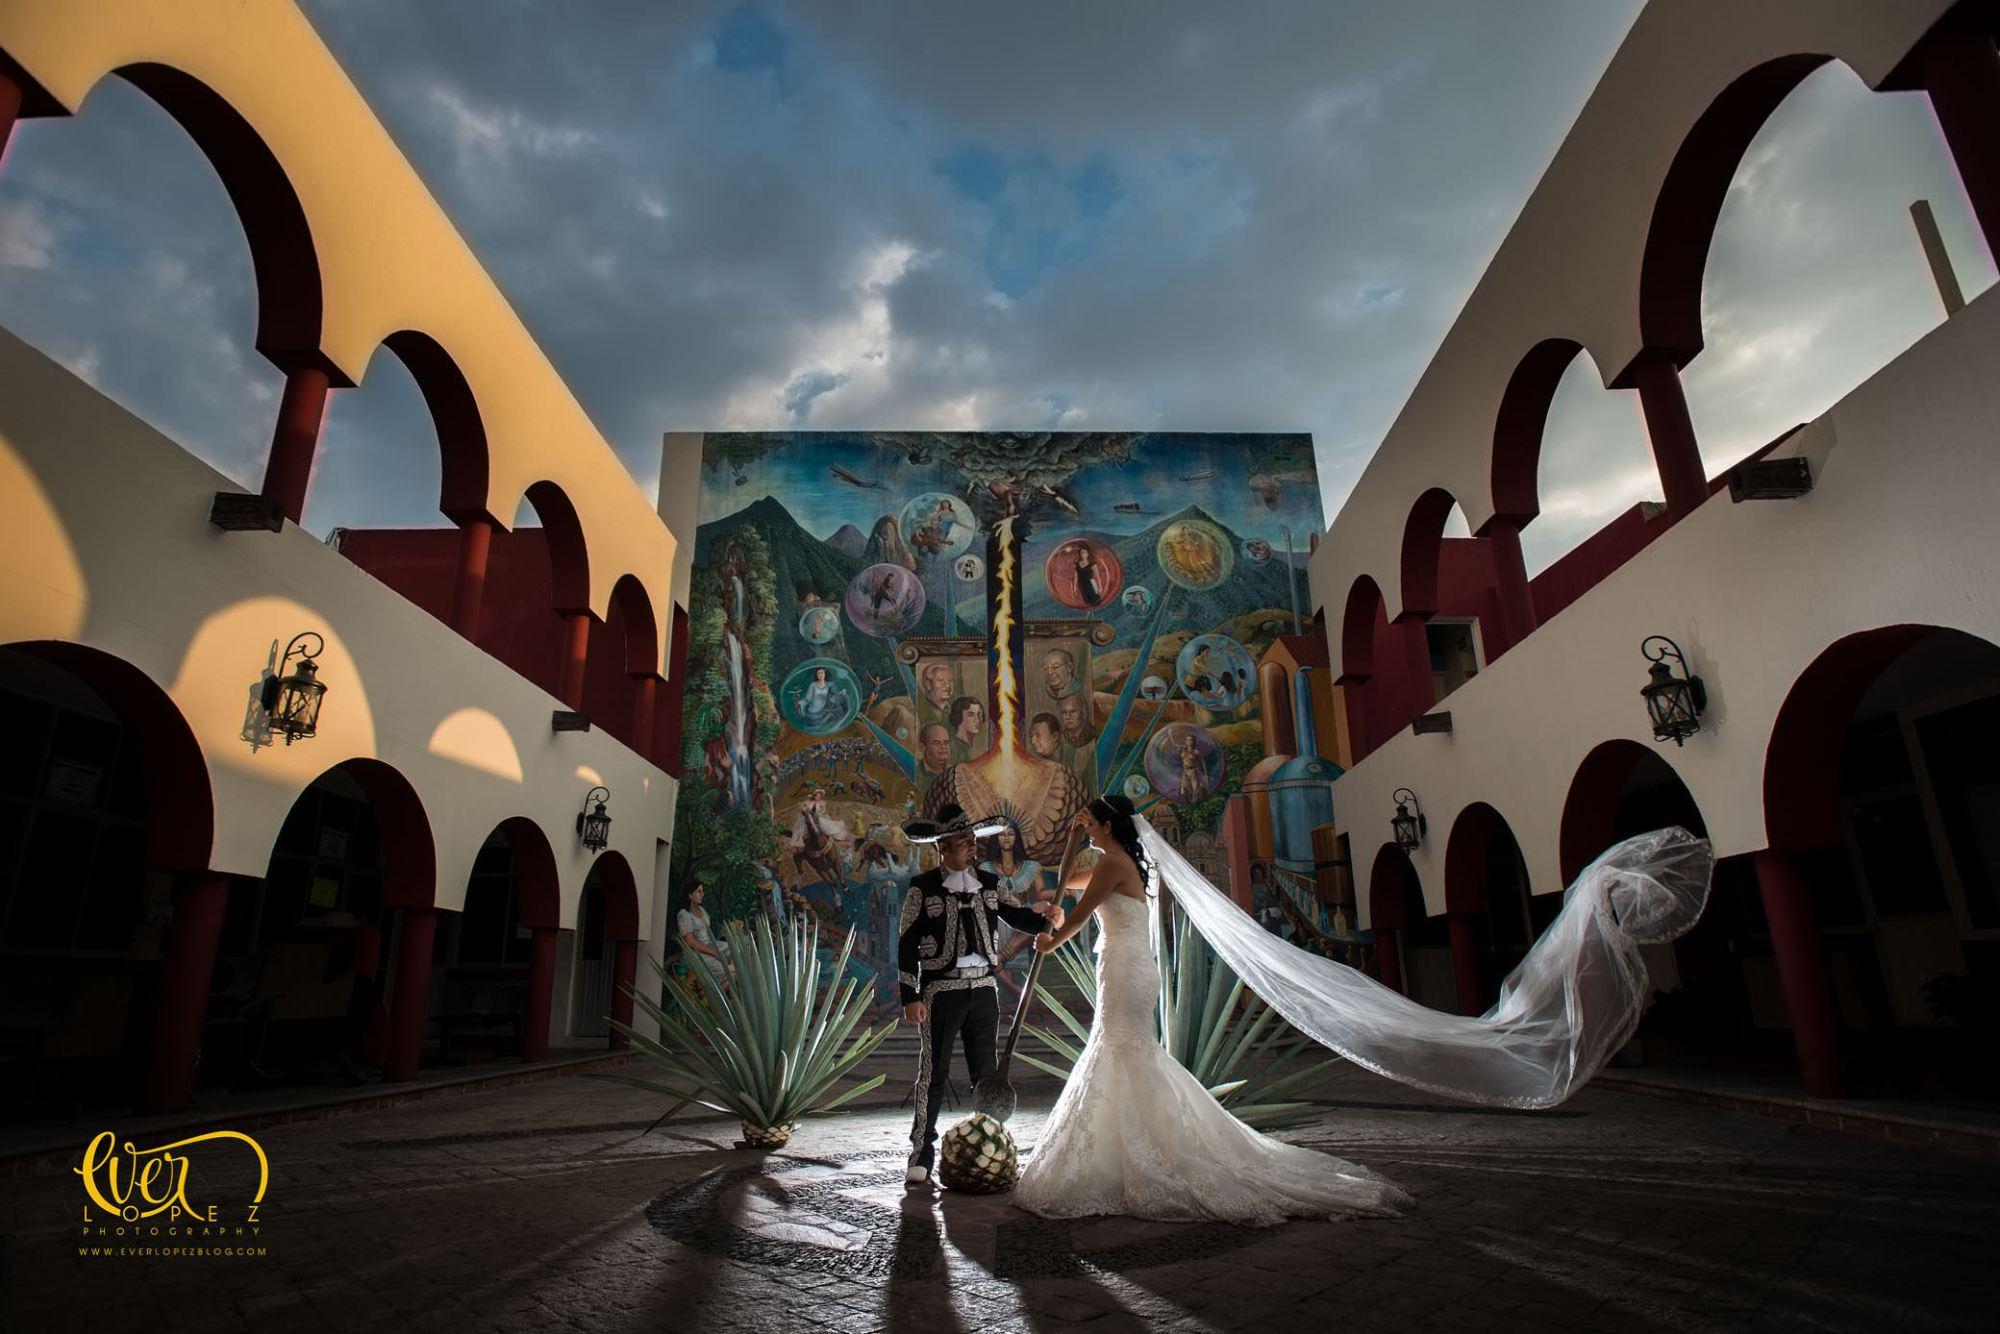 Tequila weddings